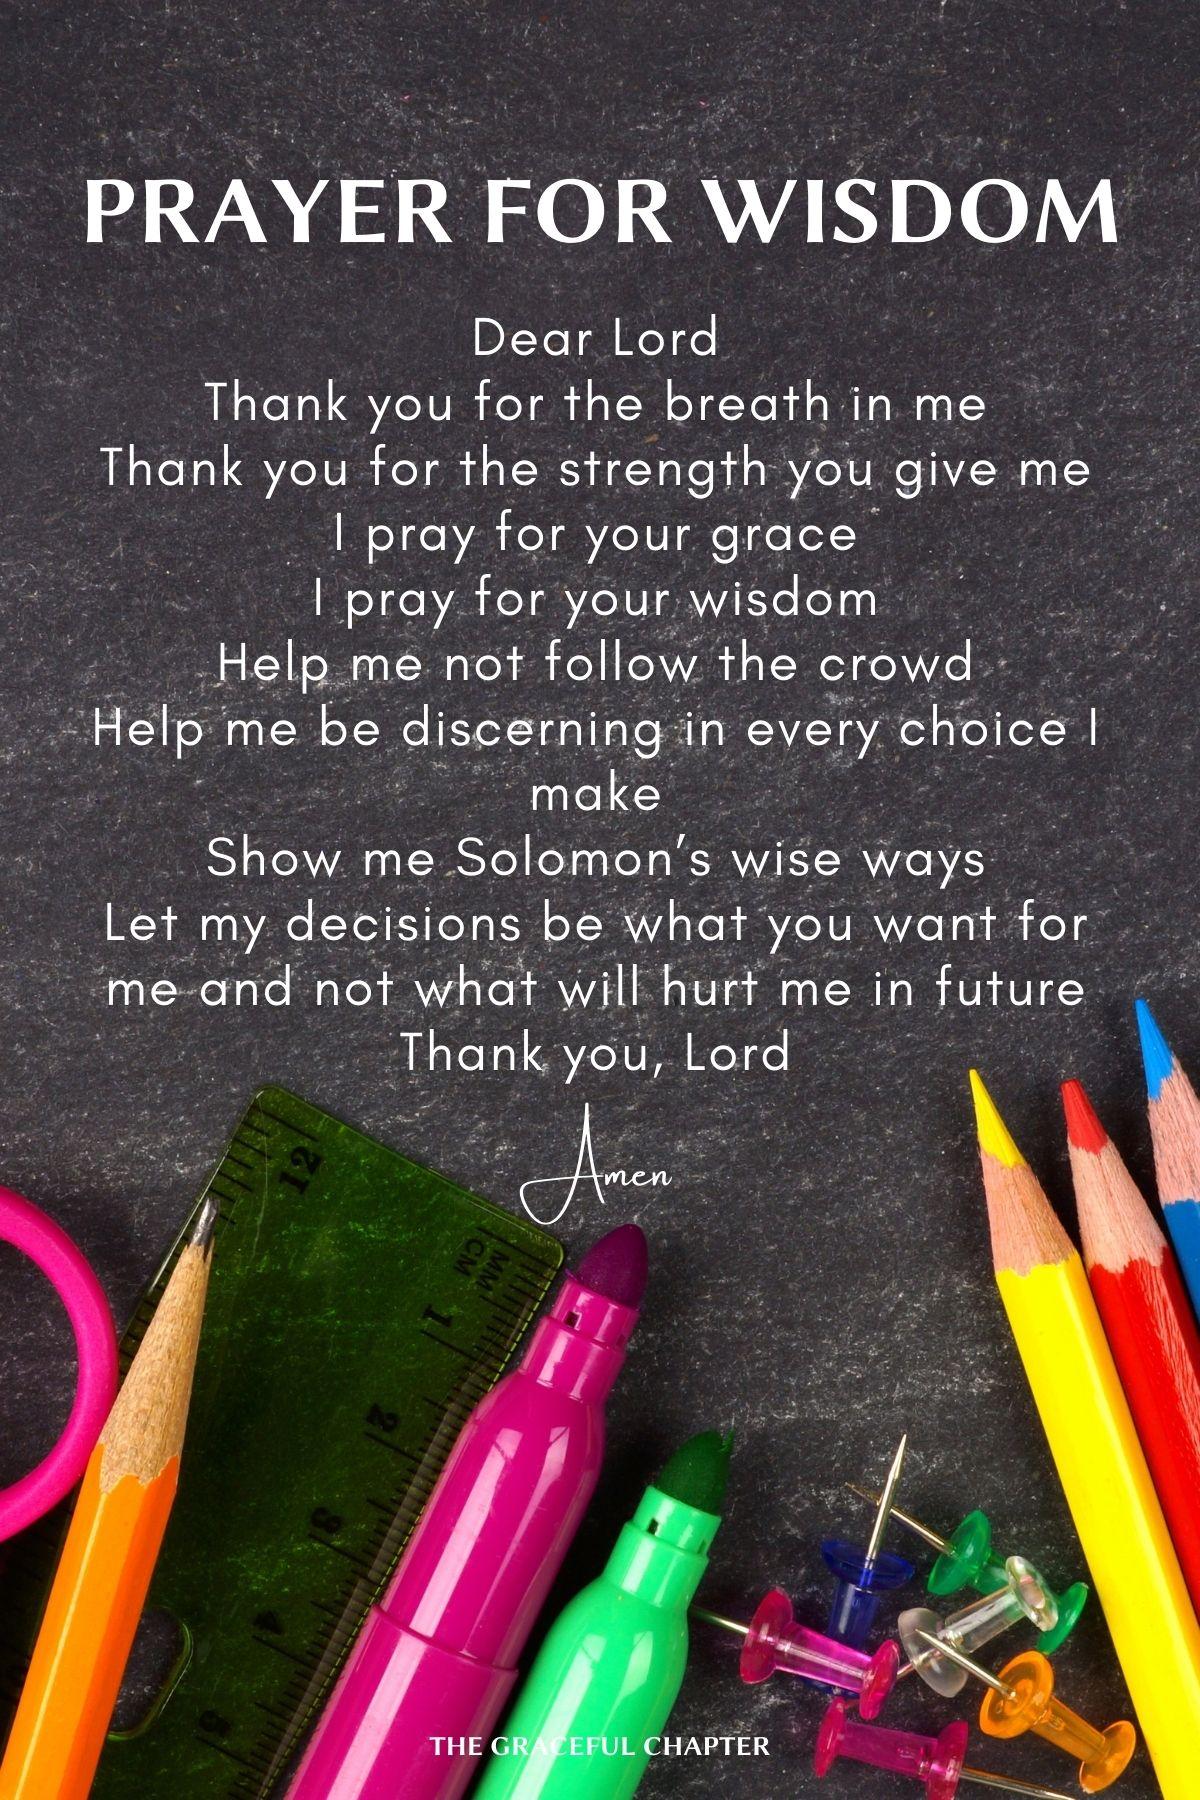 Prayers for School - Prayer for wisdom